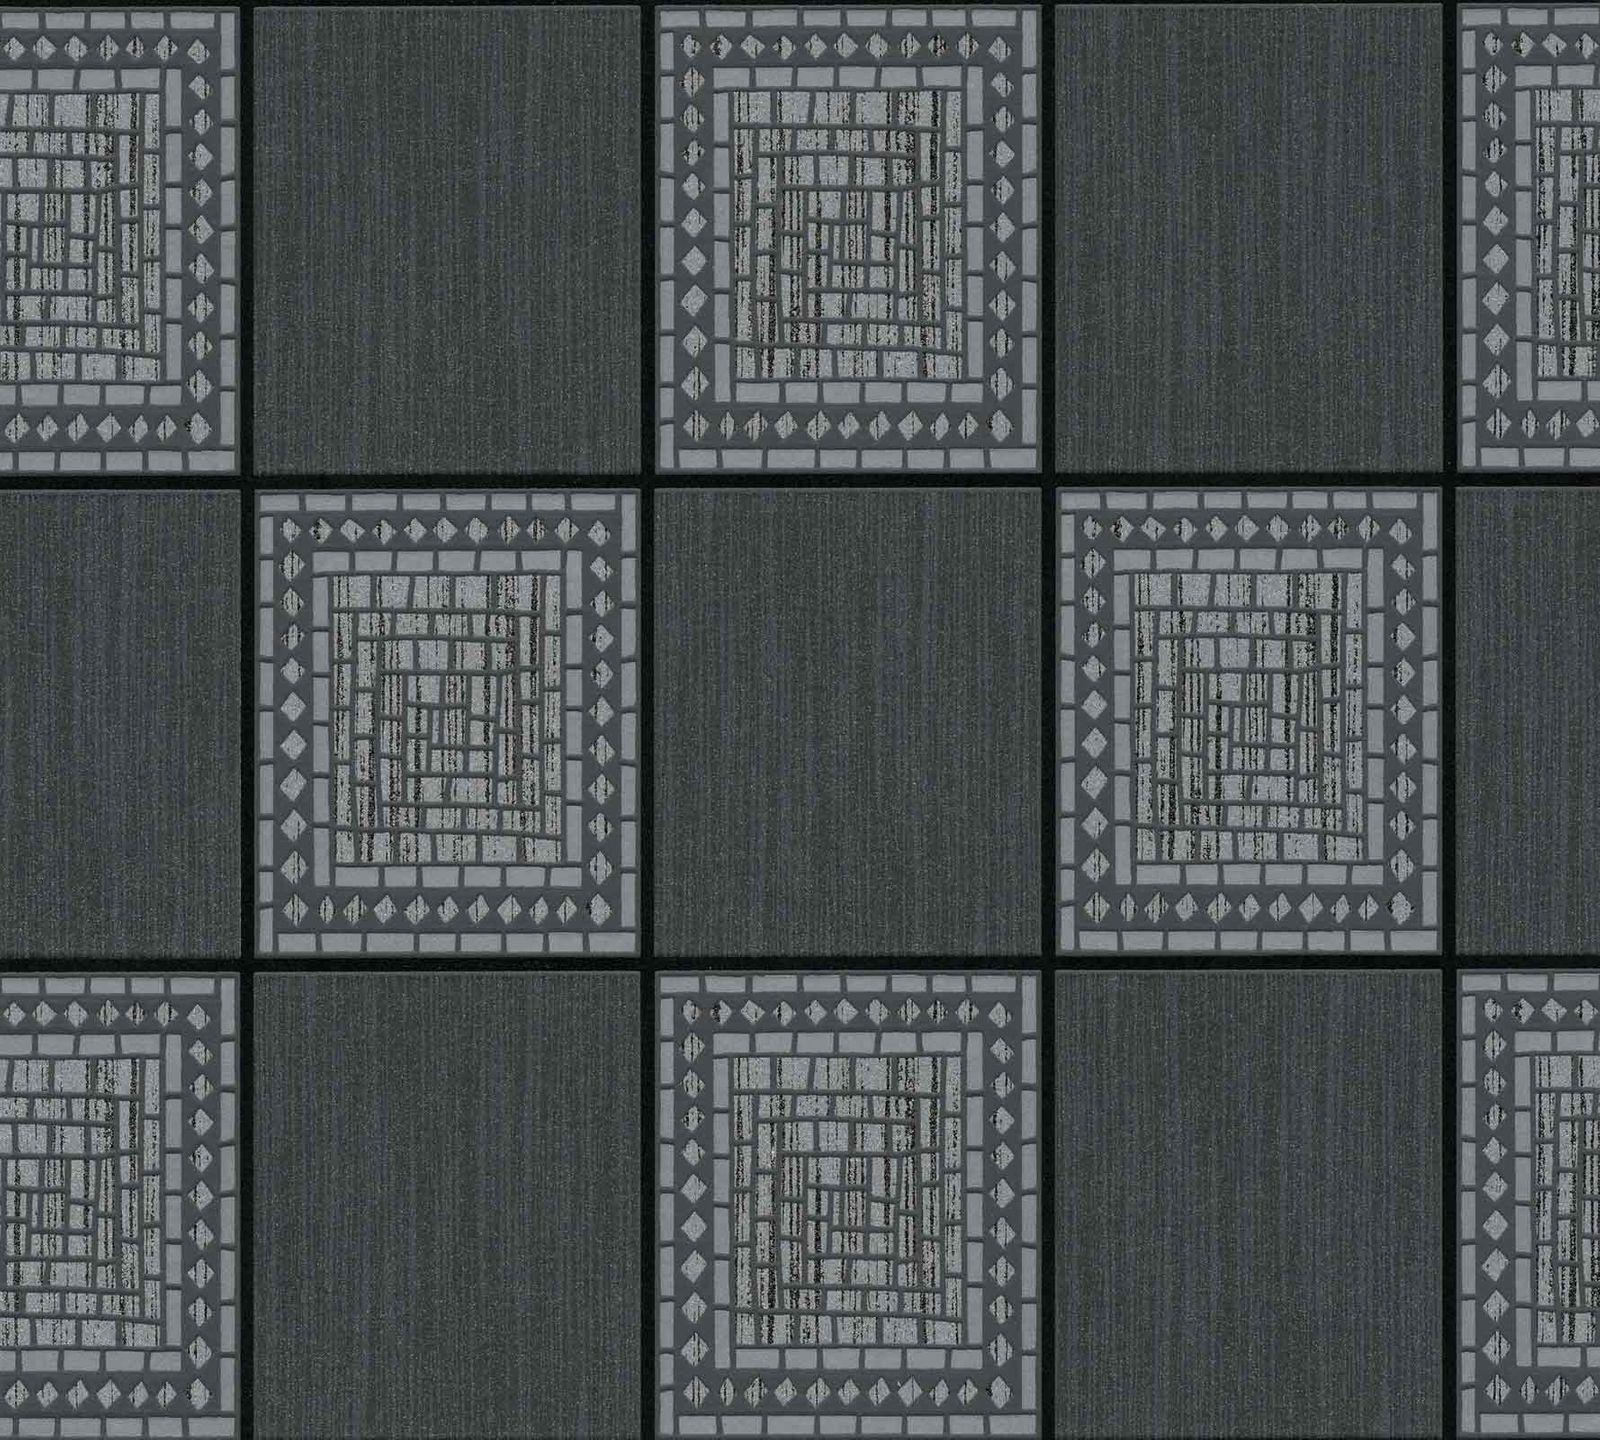 Vlies Tapete Beton Mosaik Fliesen Kacheln grau silber schwarz anthrazit metallic